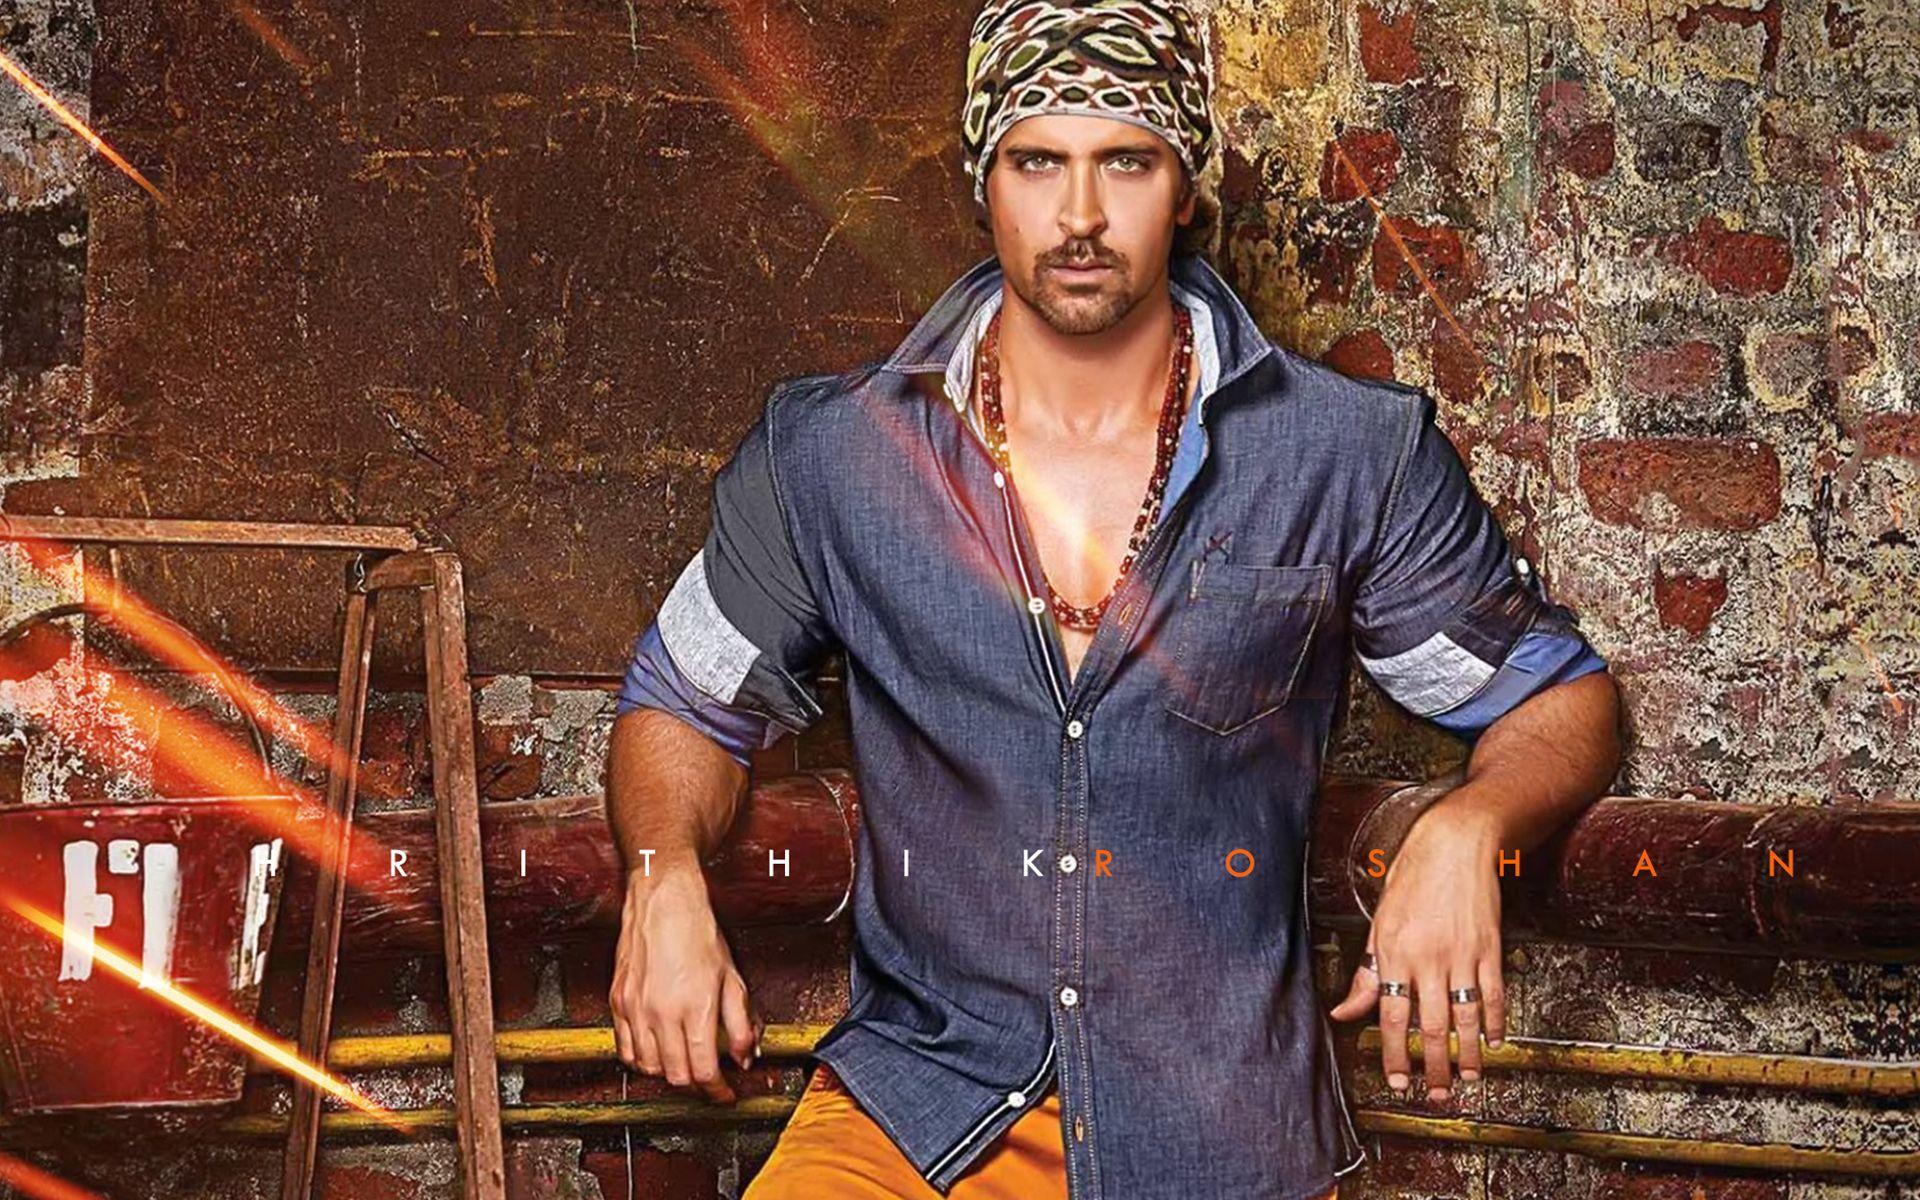 hrithik roshan hd wallpaper hrithik roshan, bollywood, actor